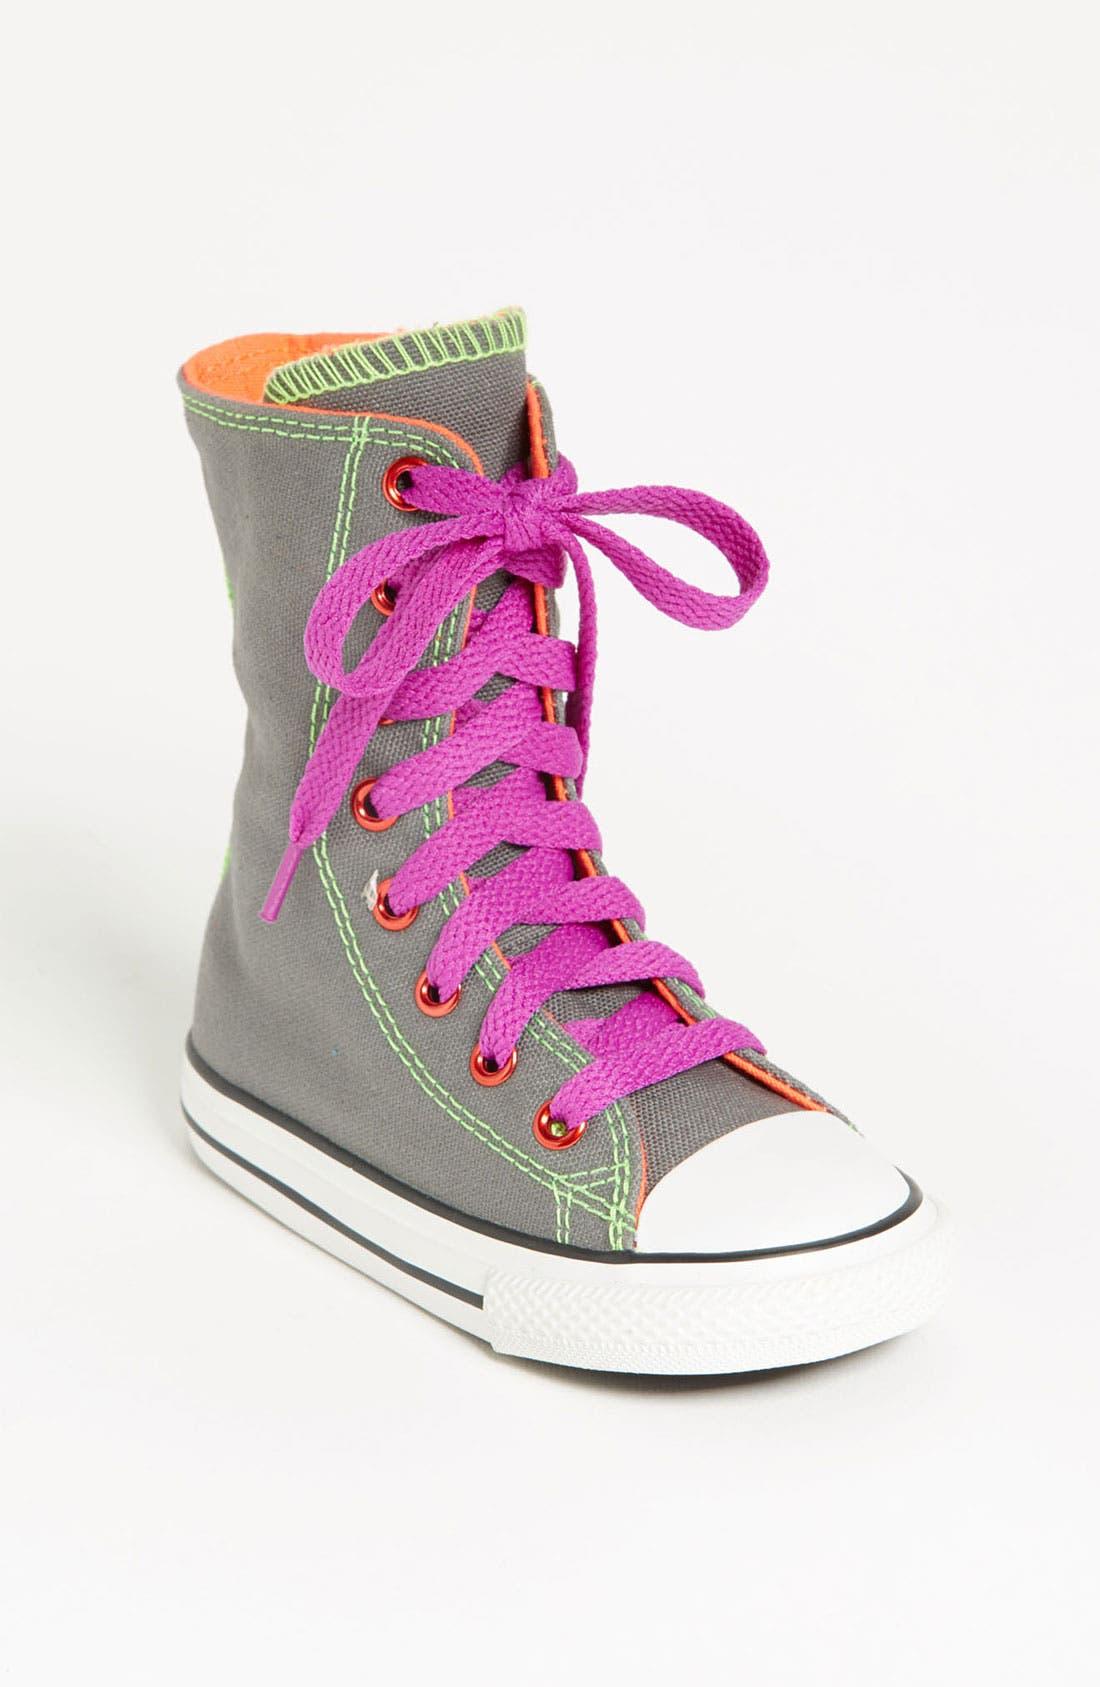 Main Image - Converse Chuck Taylor® All Star® 'Neon X-HI' Sneaker (Walker & Toddler)